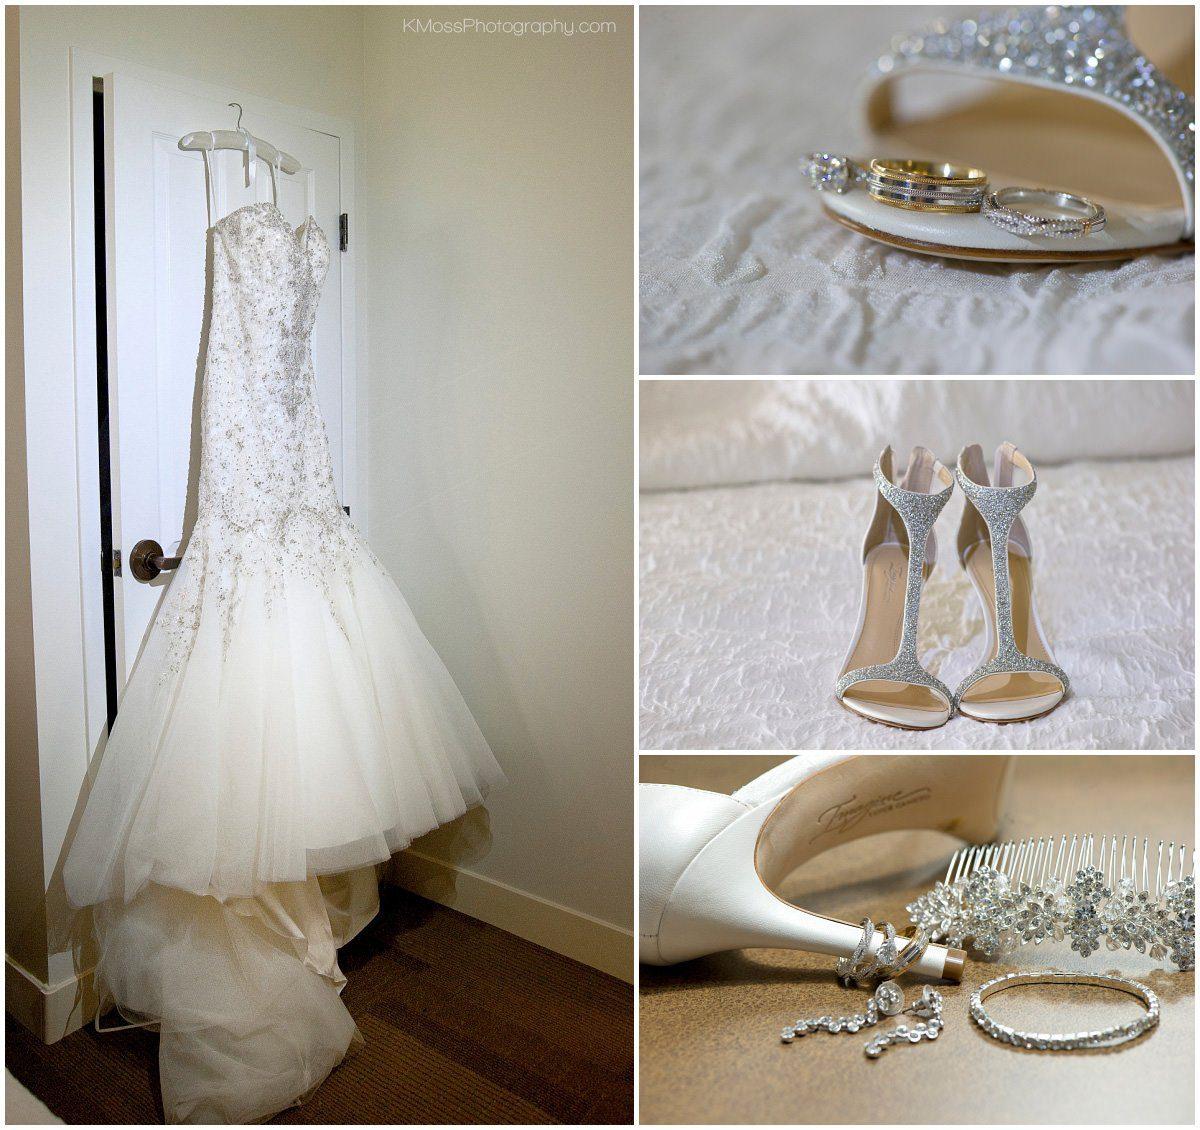 Bride Wedding Details | K. Moss Photography